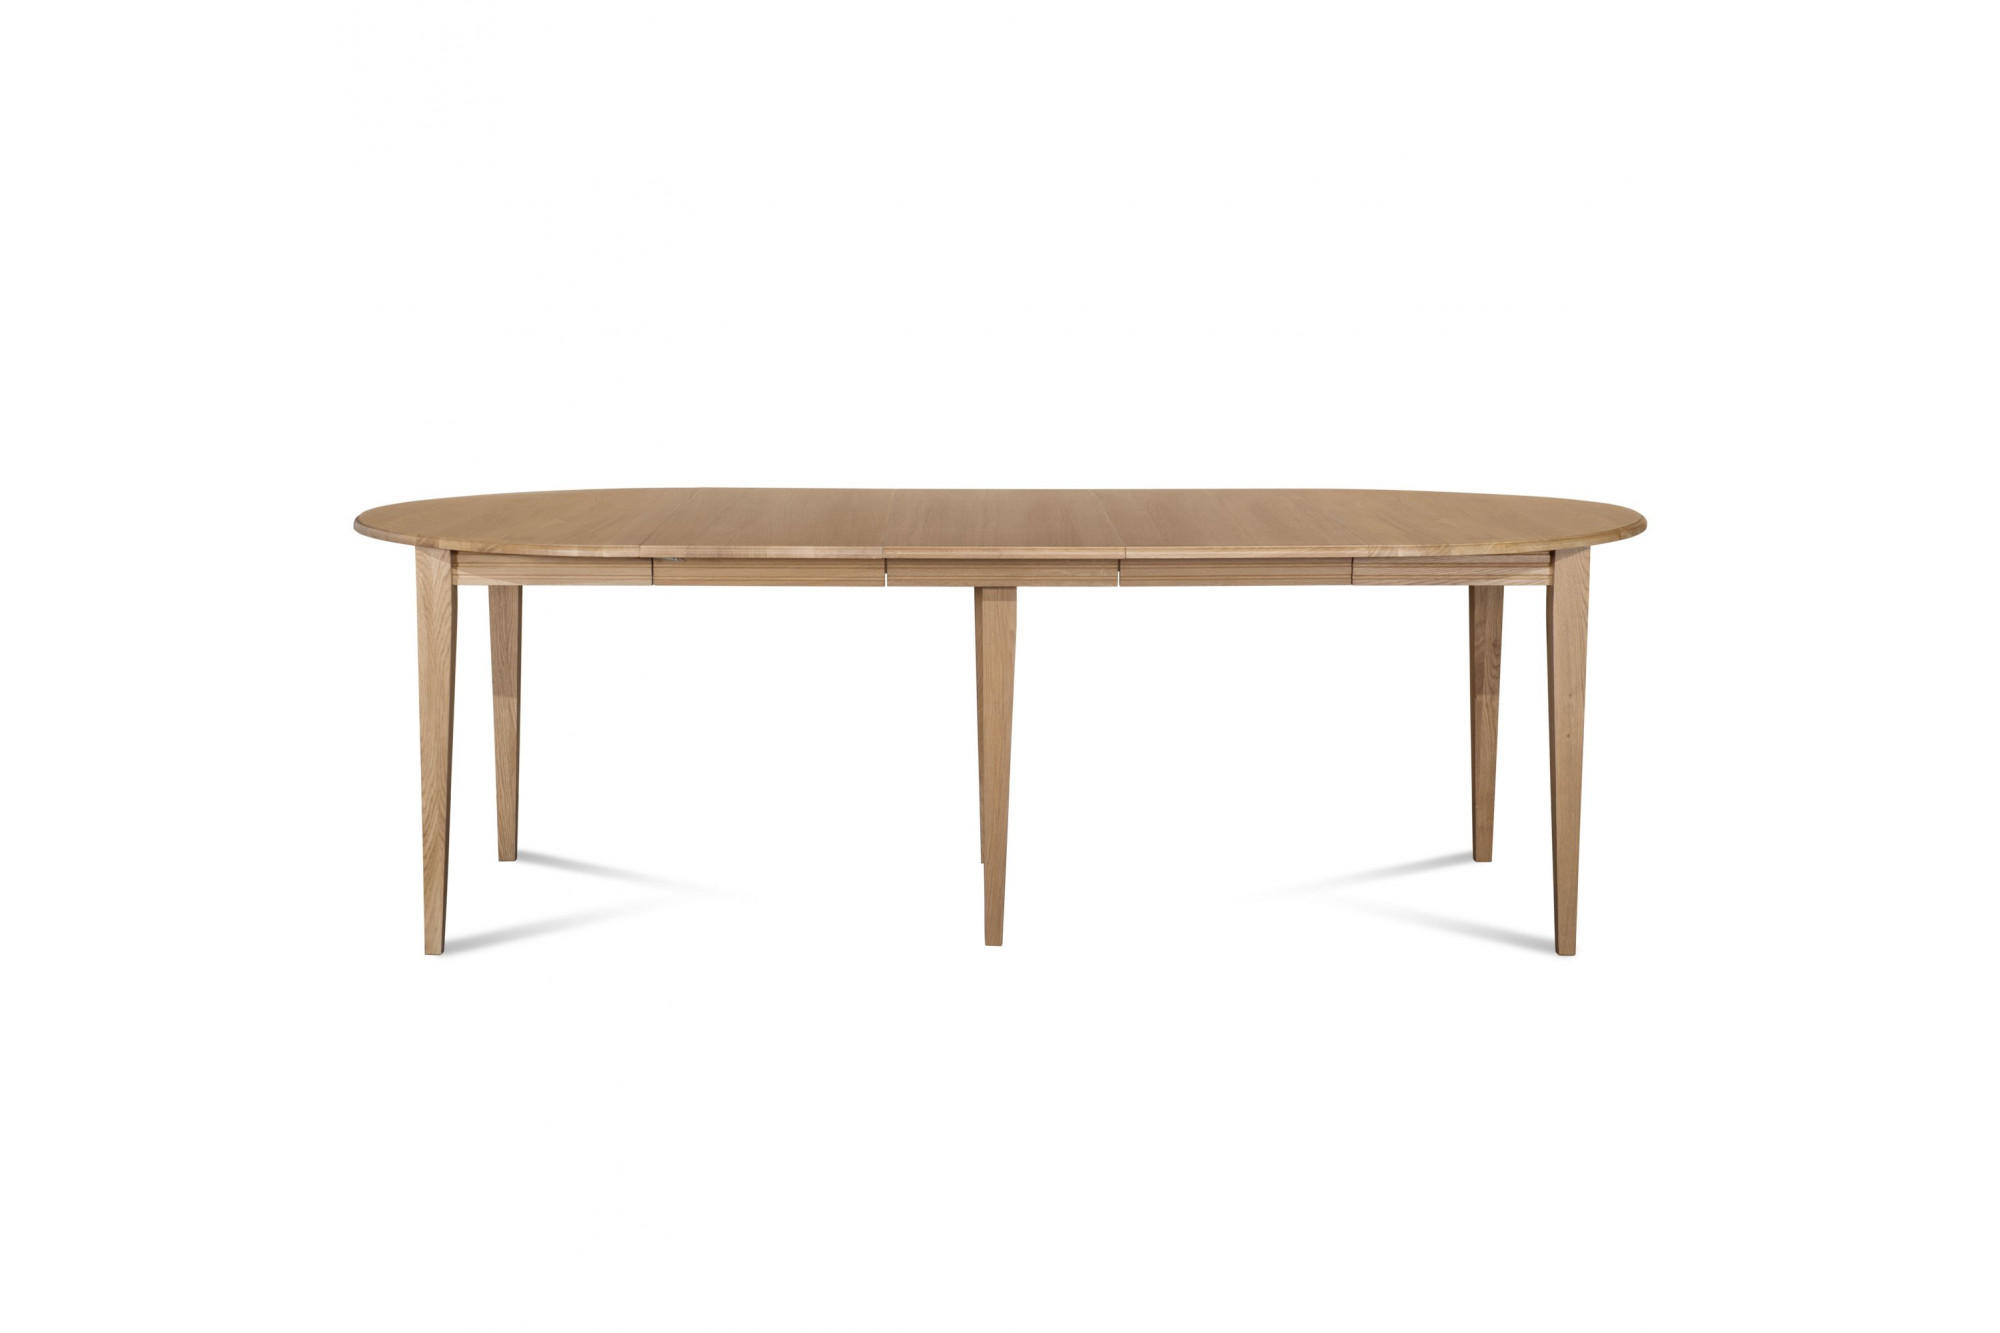 table ronde 6 pieds fuseau ch ne massif hellin. Black Bedroom Furniture Sets. Home Design Ideas